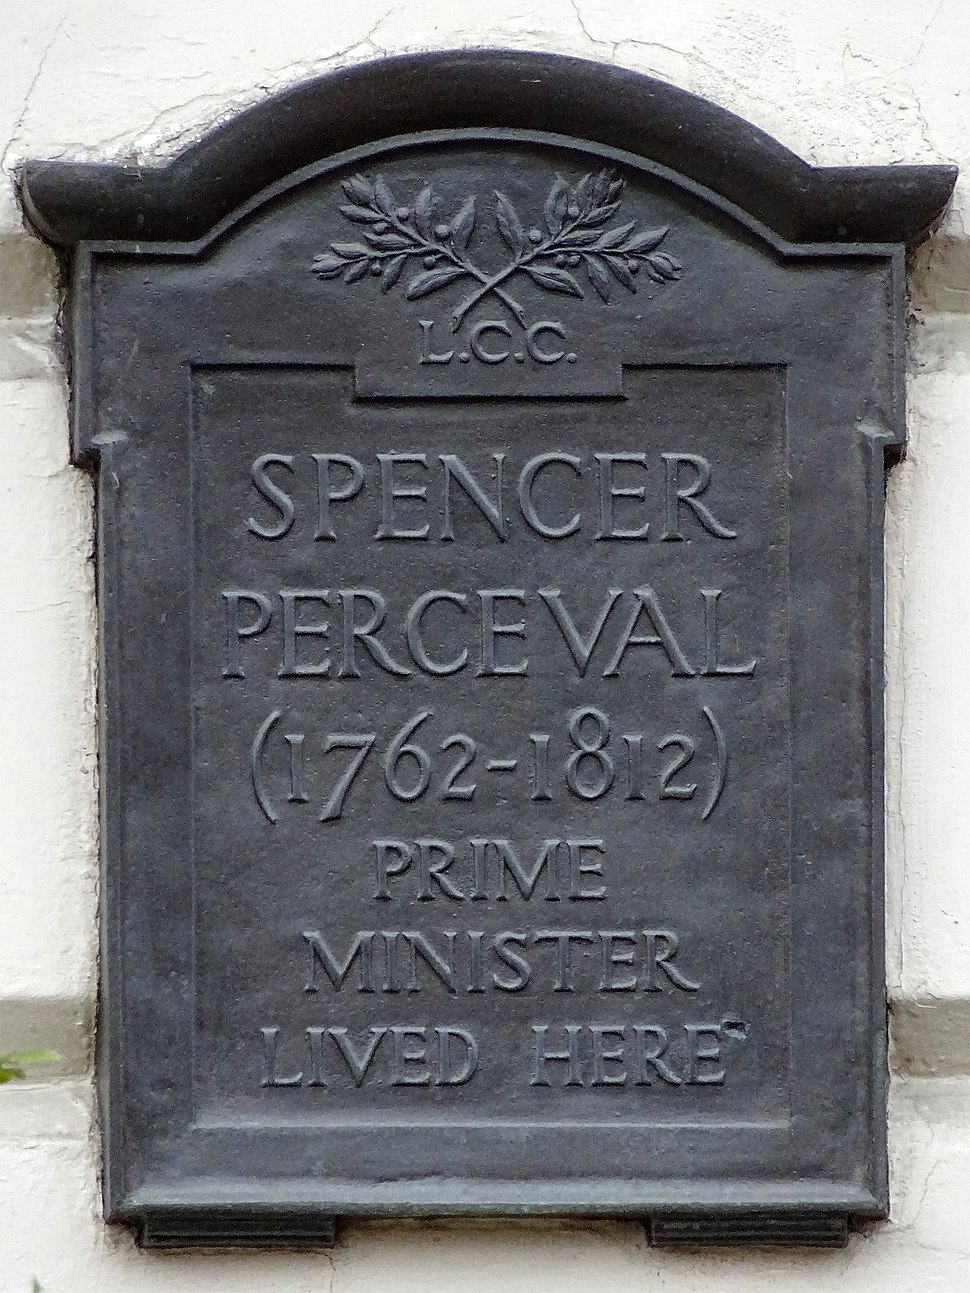 Spencer Perceval (1762-1812) Prime Minister lived here